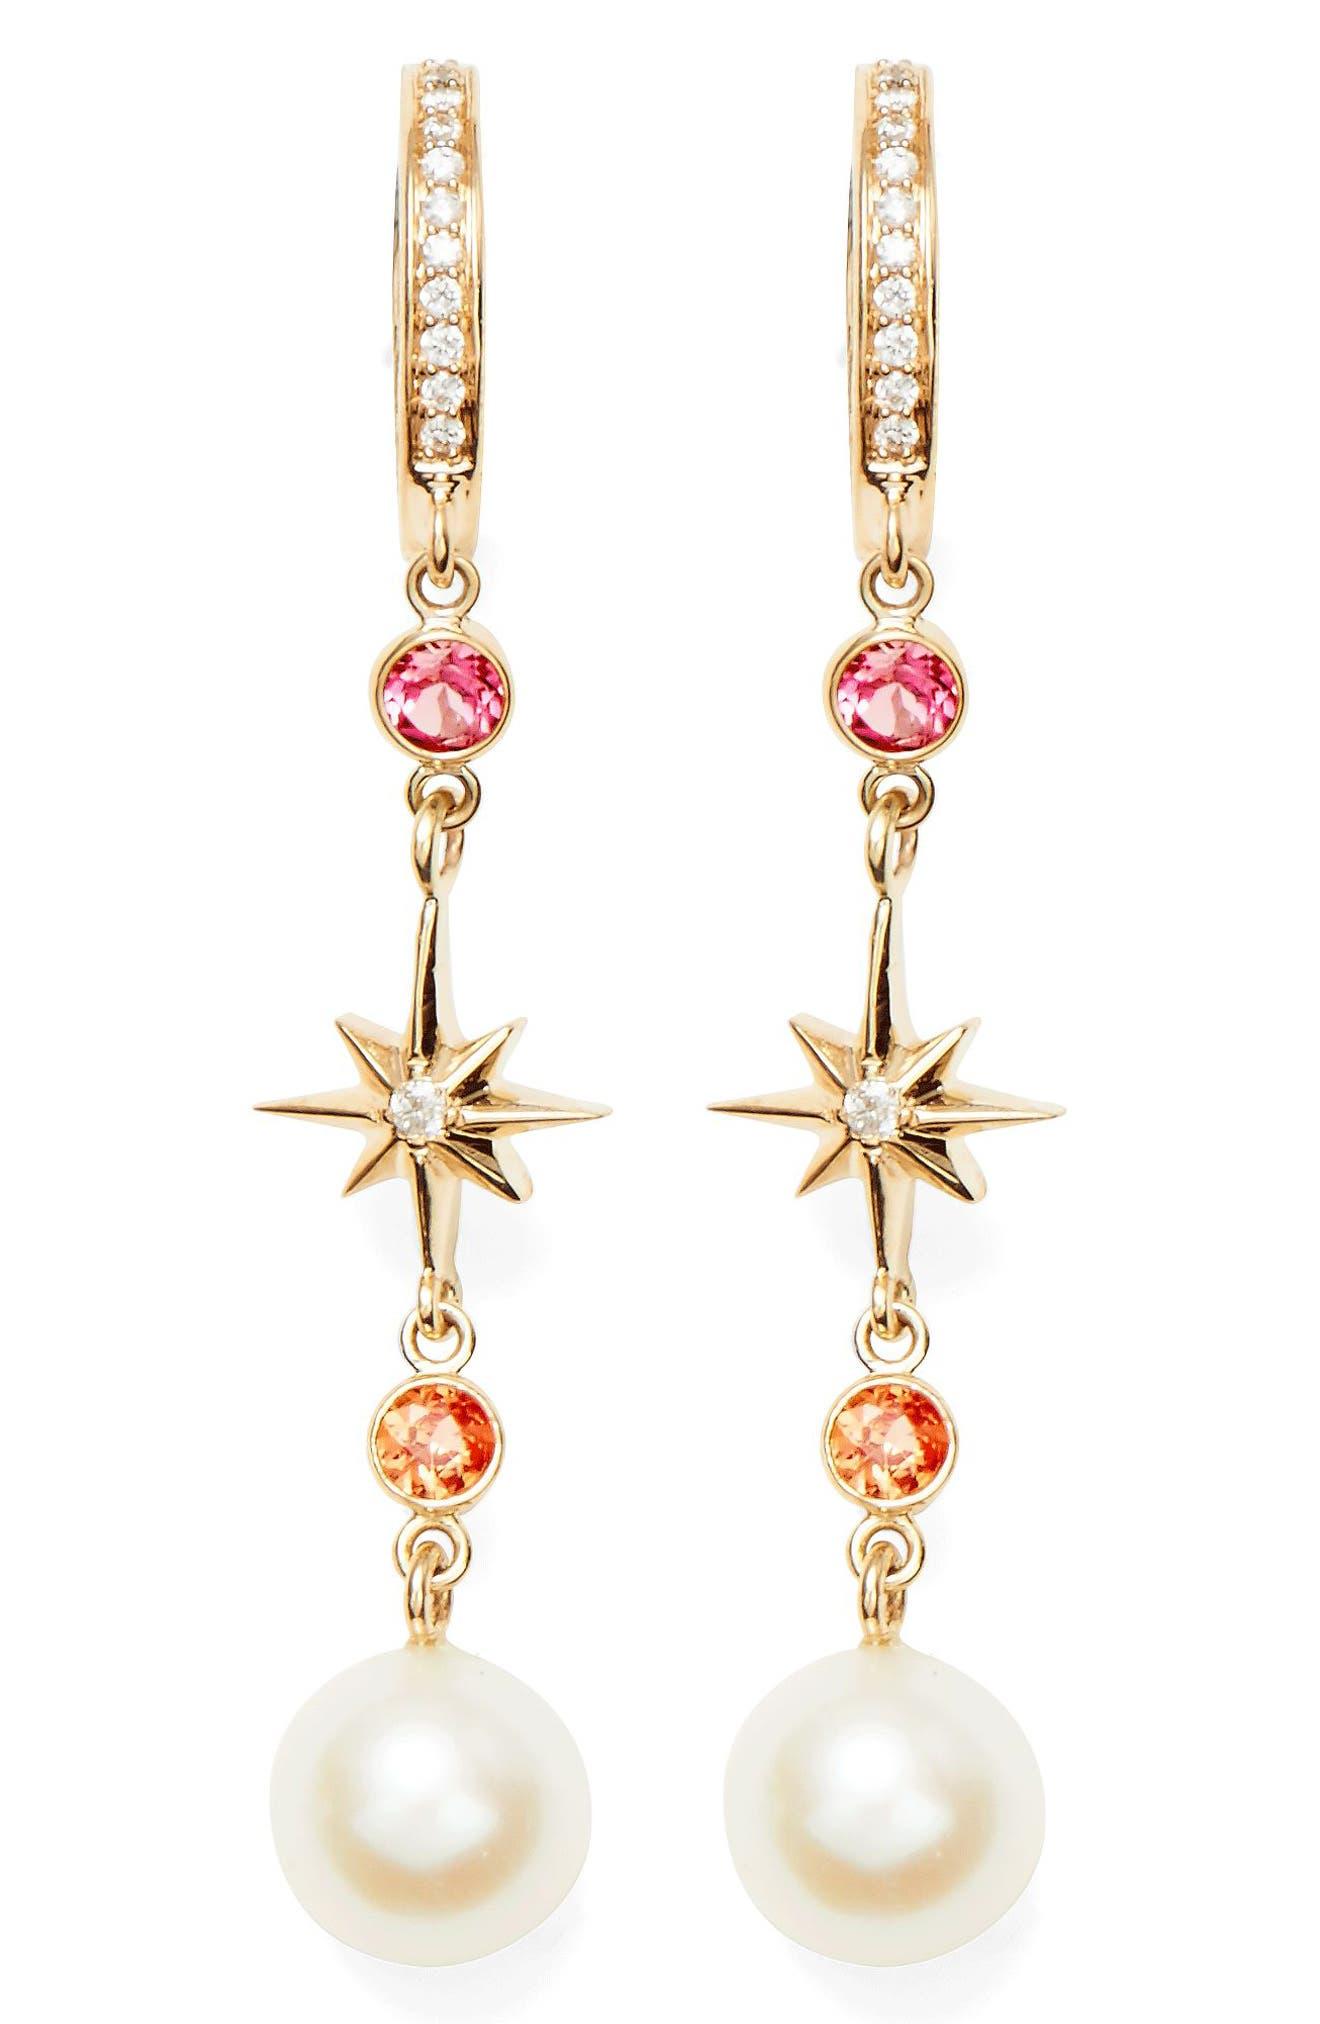 Elixir Linear Pearl, Diamond & Stone Drop Earrings,                             Main thumbnail 1, color,                             YELLOW GOLD